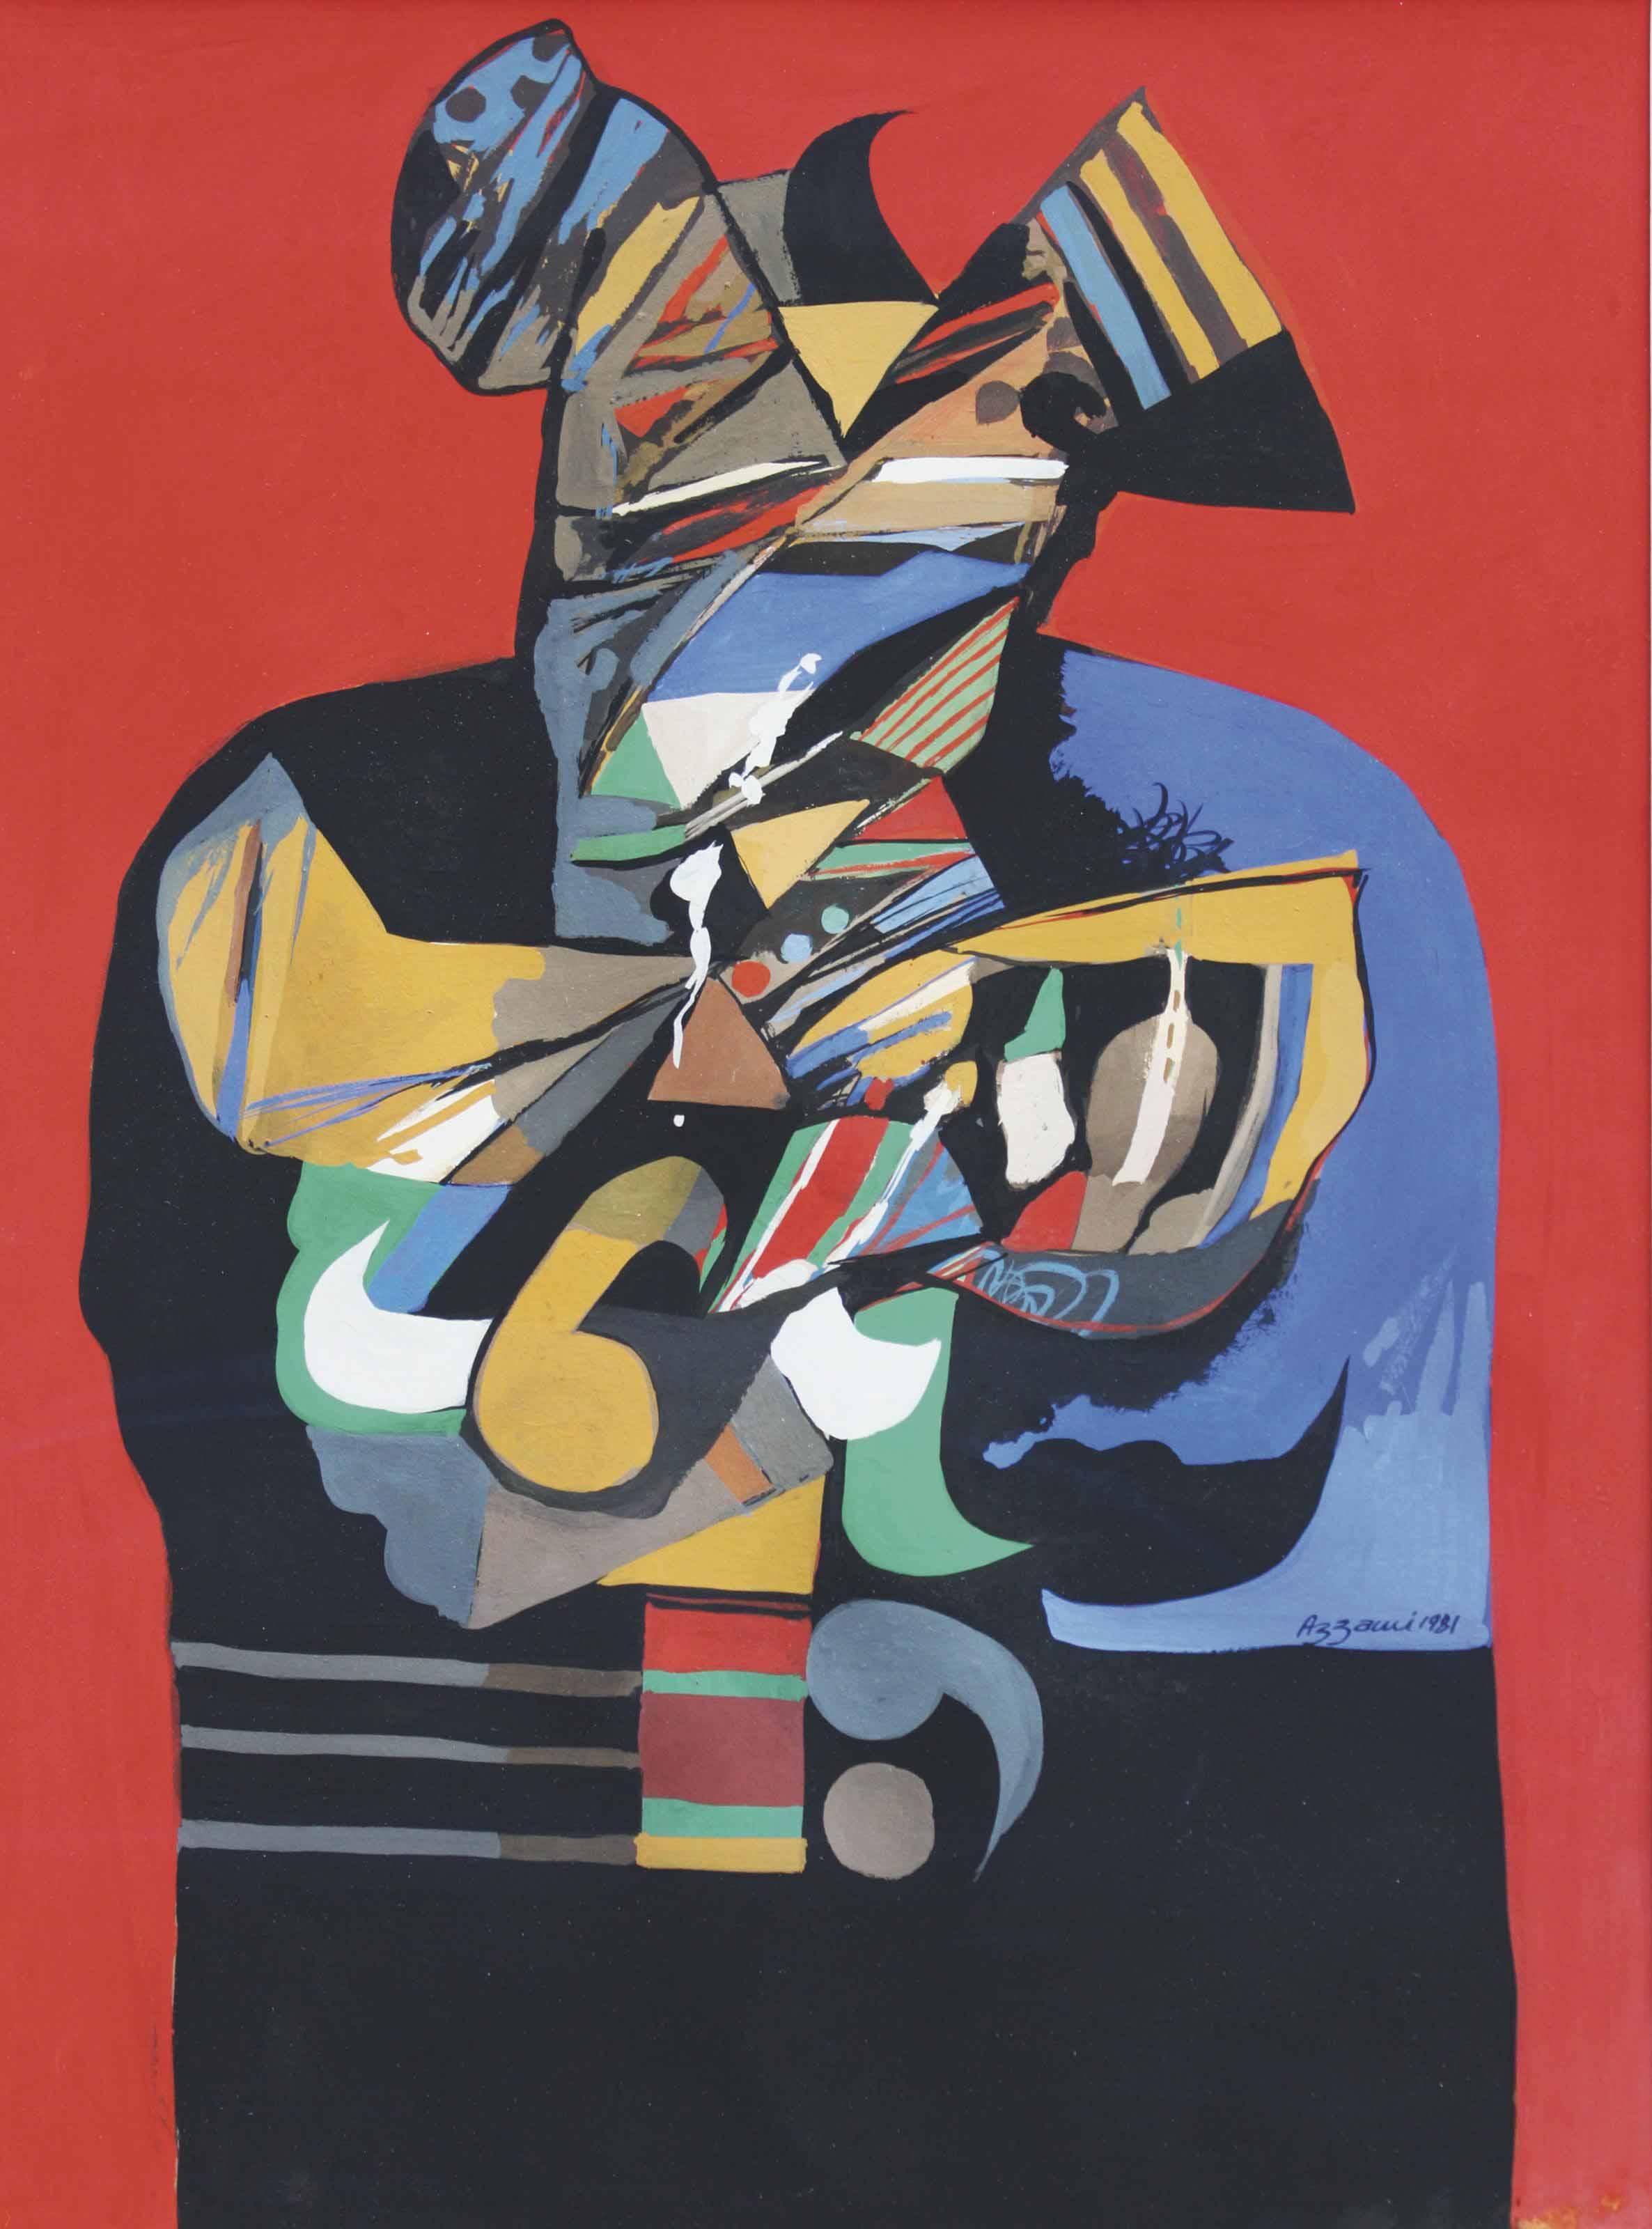 Diary V by DiaAzzawi | Cubist art, Middle eastern art, Art